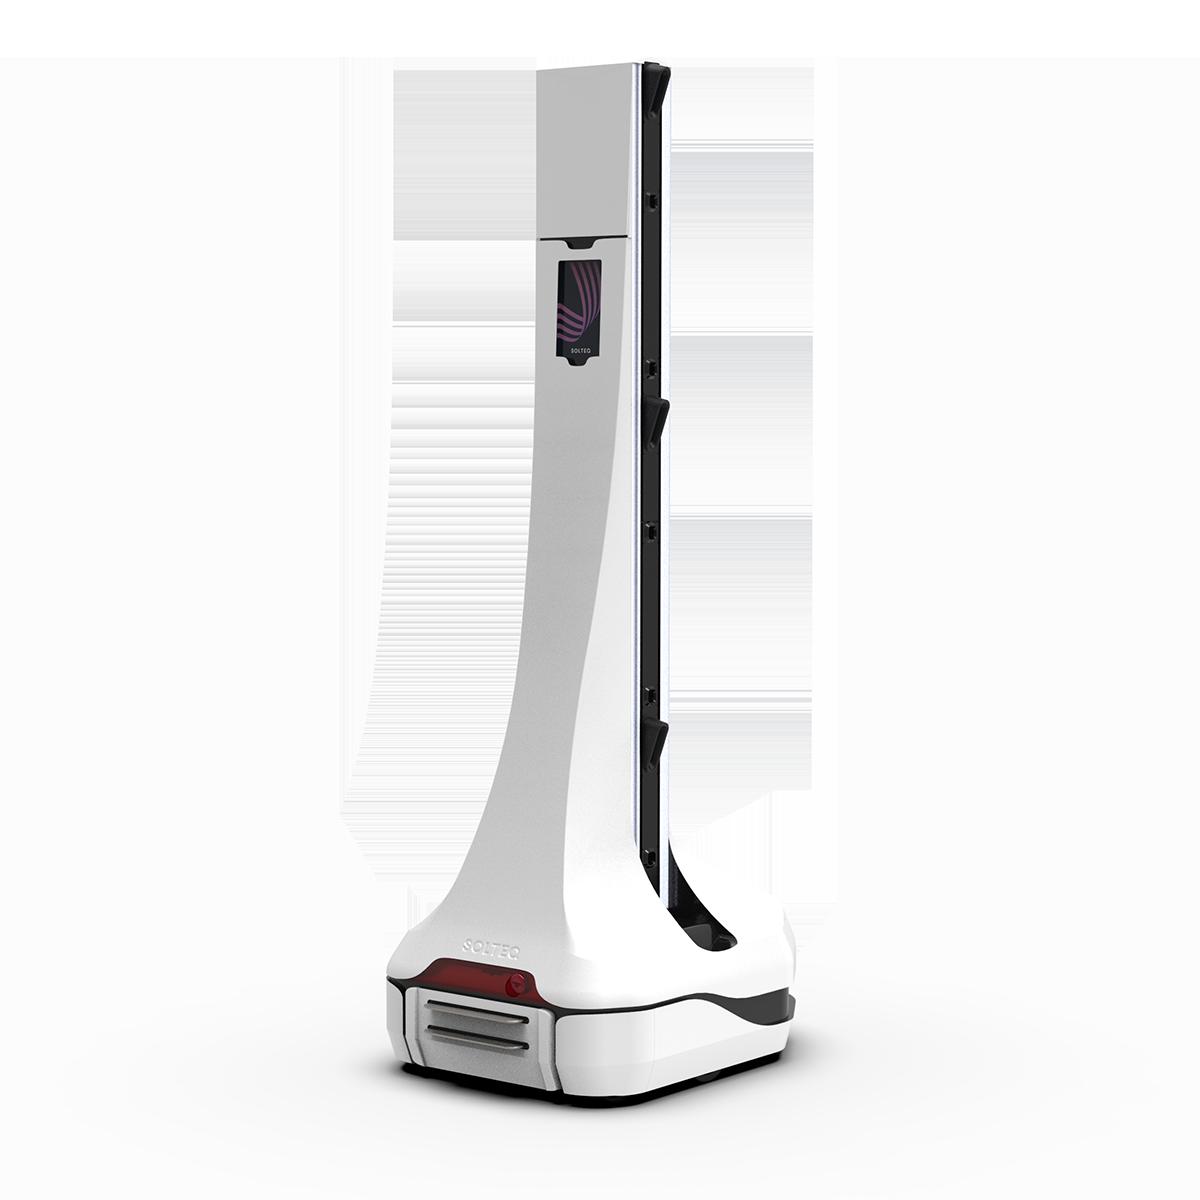 Solteq Retail Robot